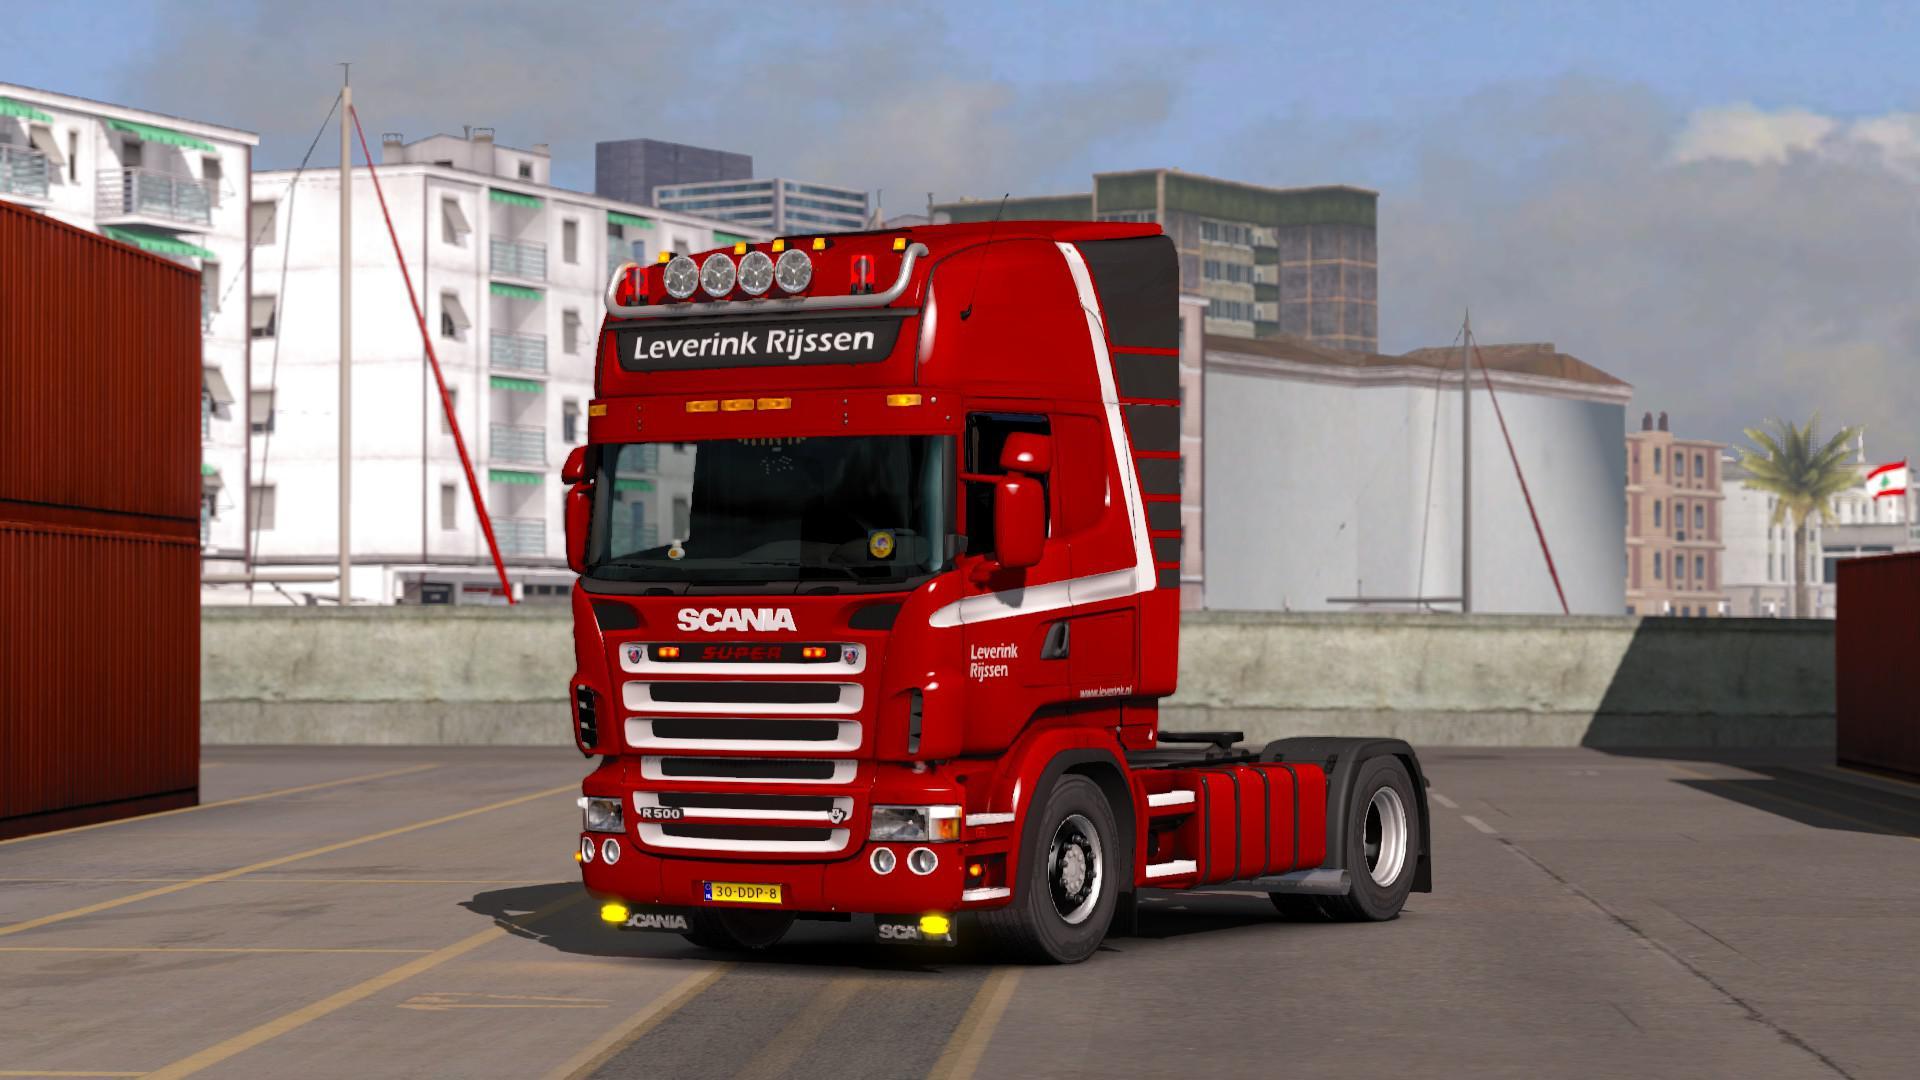 ETS2 - Scania RJL Leverink Rijssen V1.0 (1.35.X)